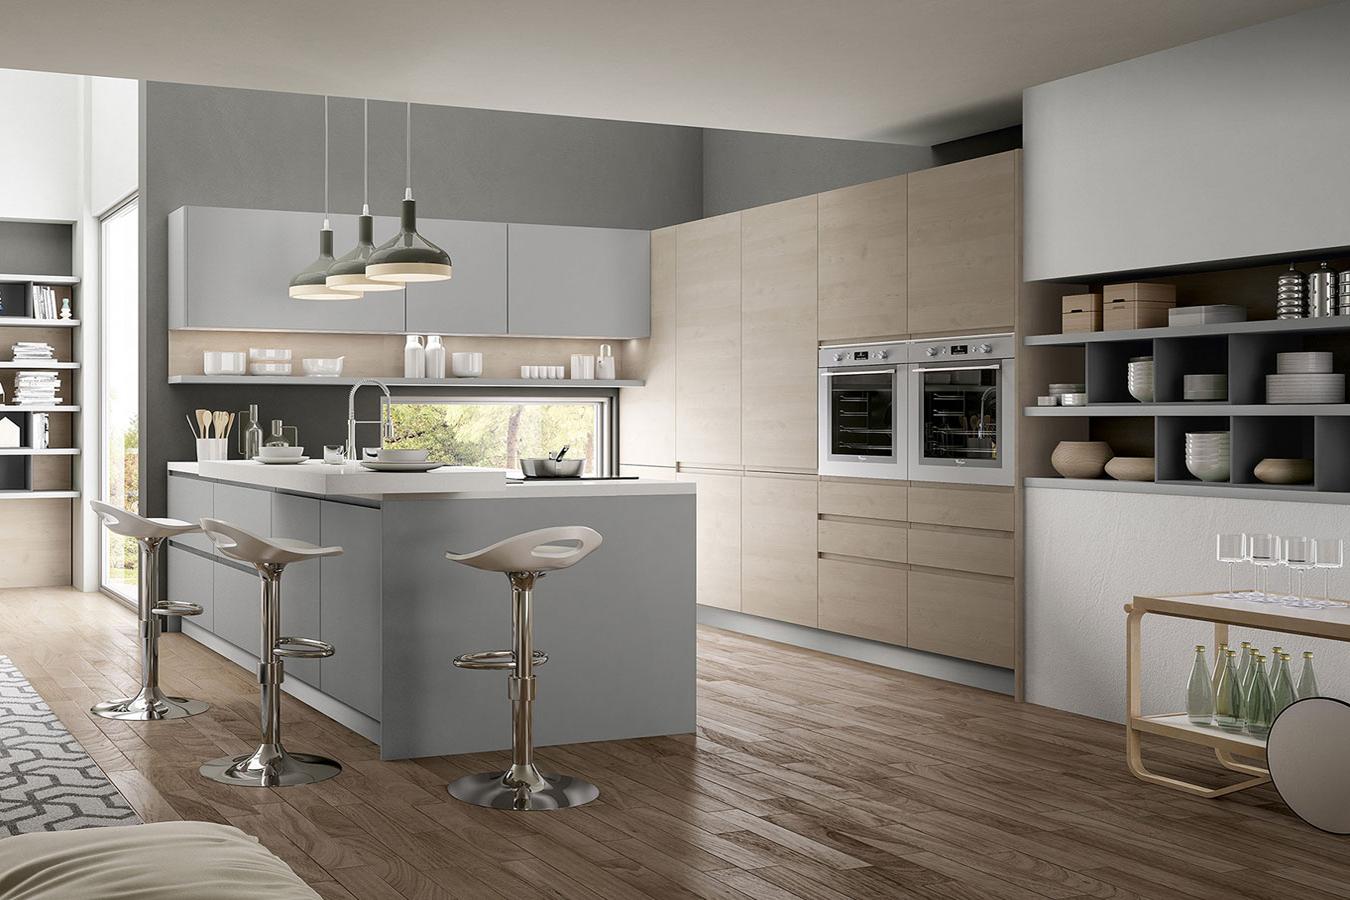 Cucina wega di arredo3 righetti mobili novara for Mobili arredo cucina